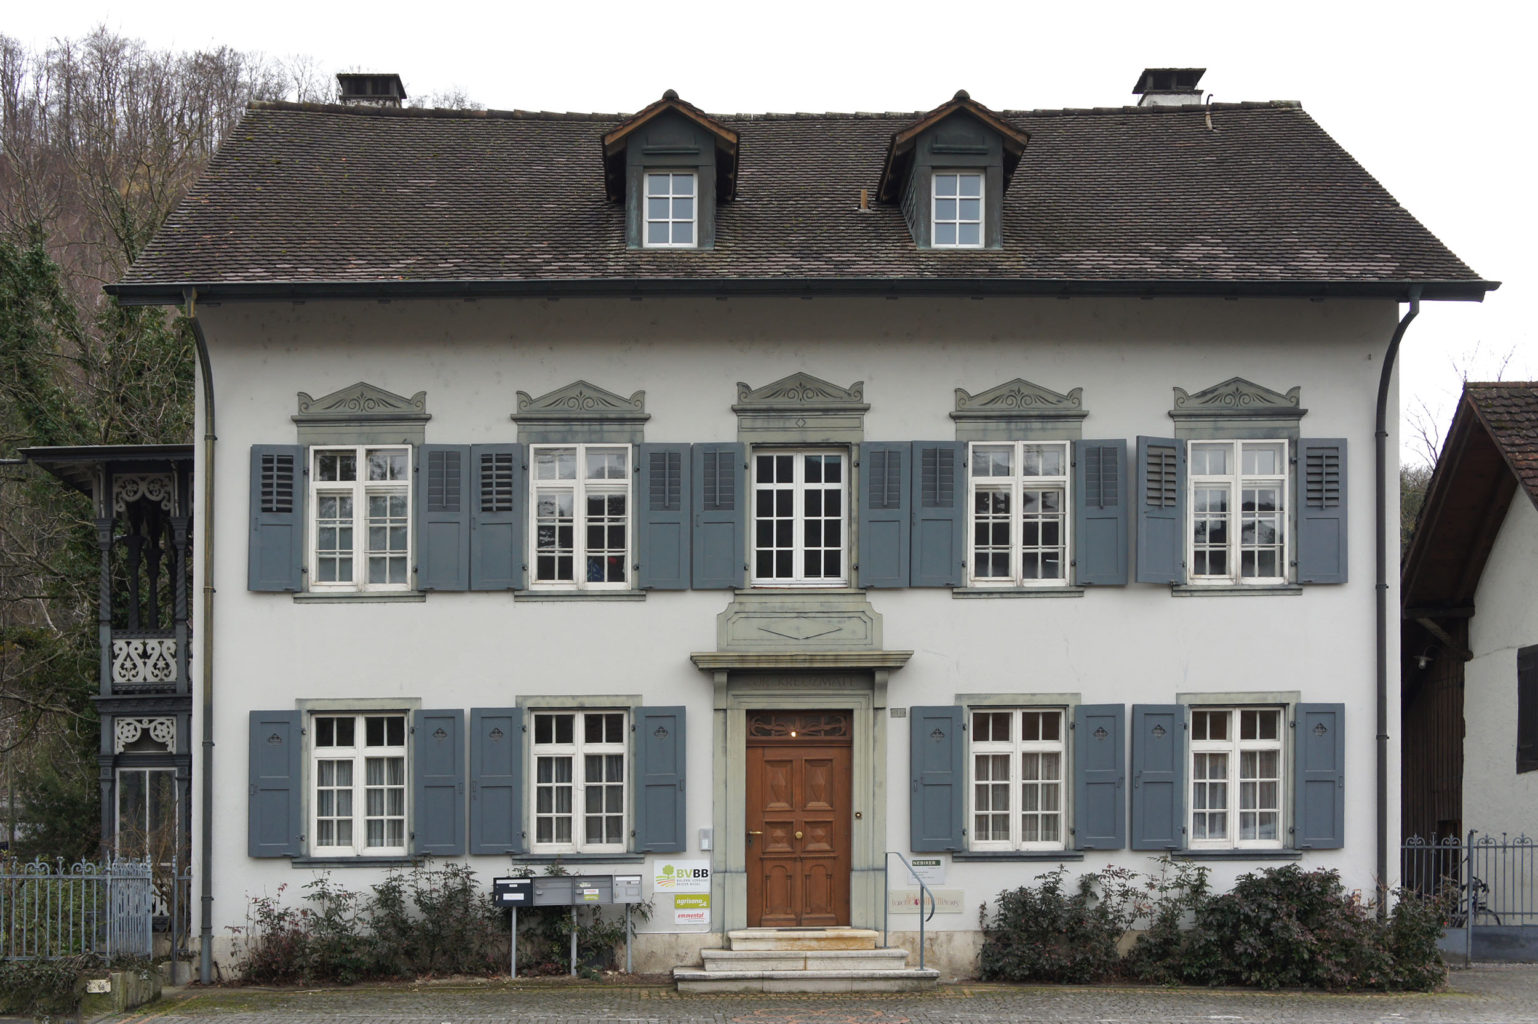 Ehemaliger Gasthof Kreuzmatt, Sissach © Architektur Basel